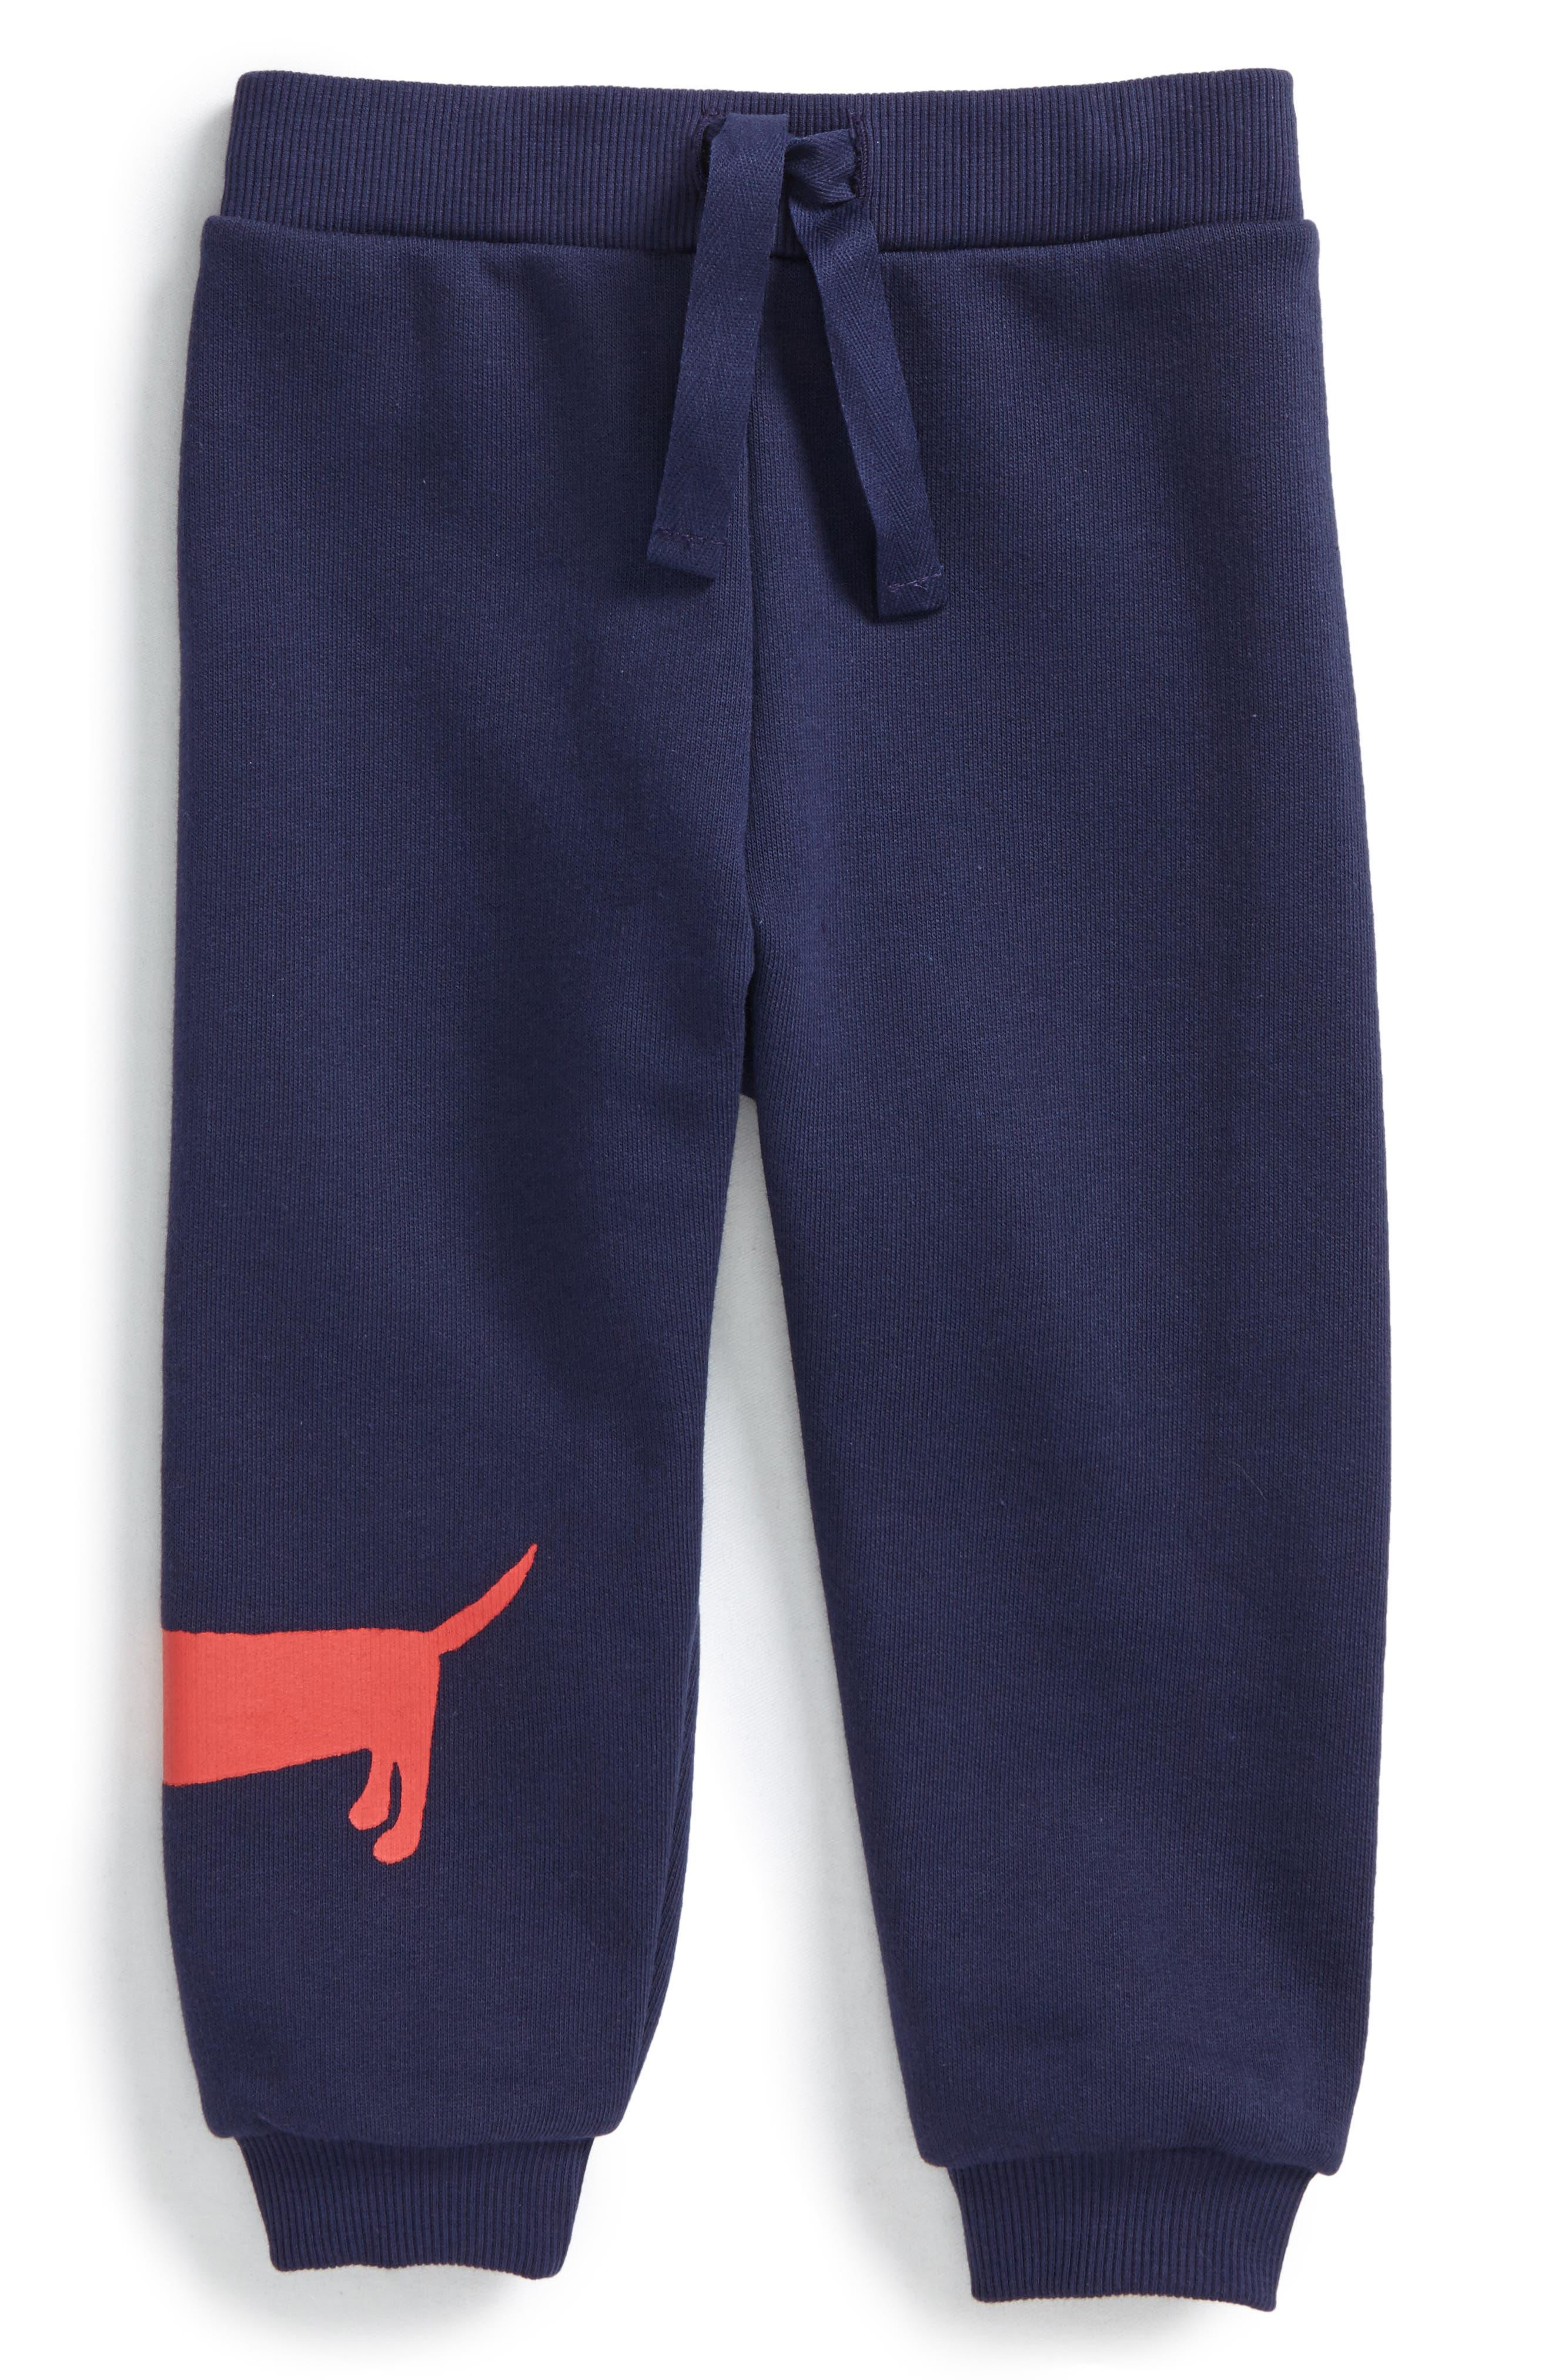 Dog Sweatpants,                             Main thumbnail 1, color,                             410